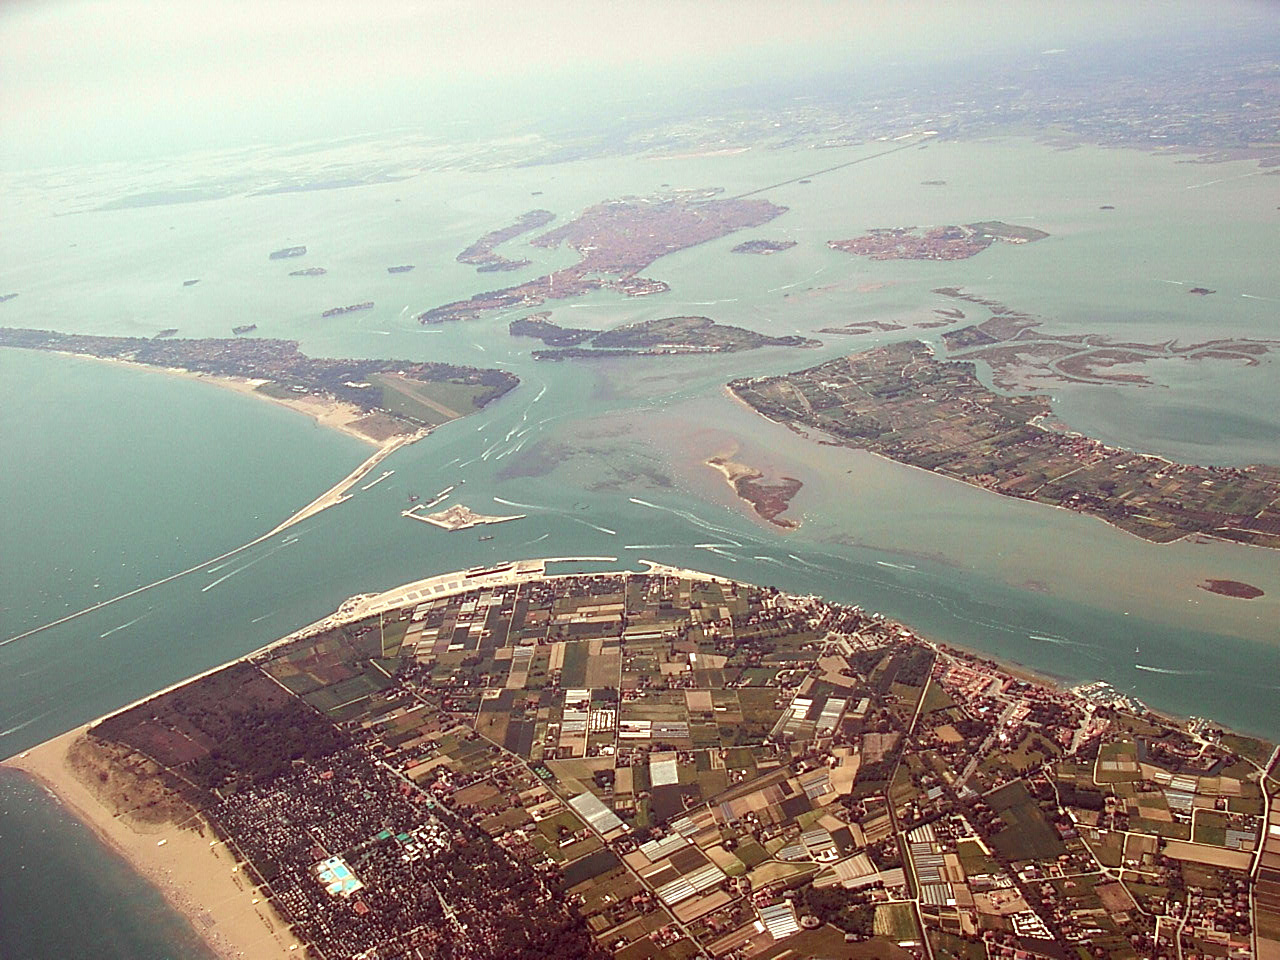 Lagune van Venetië